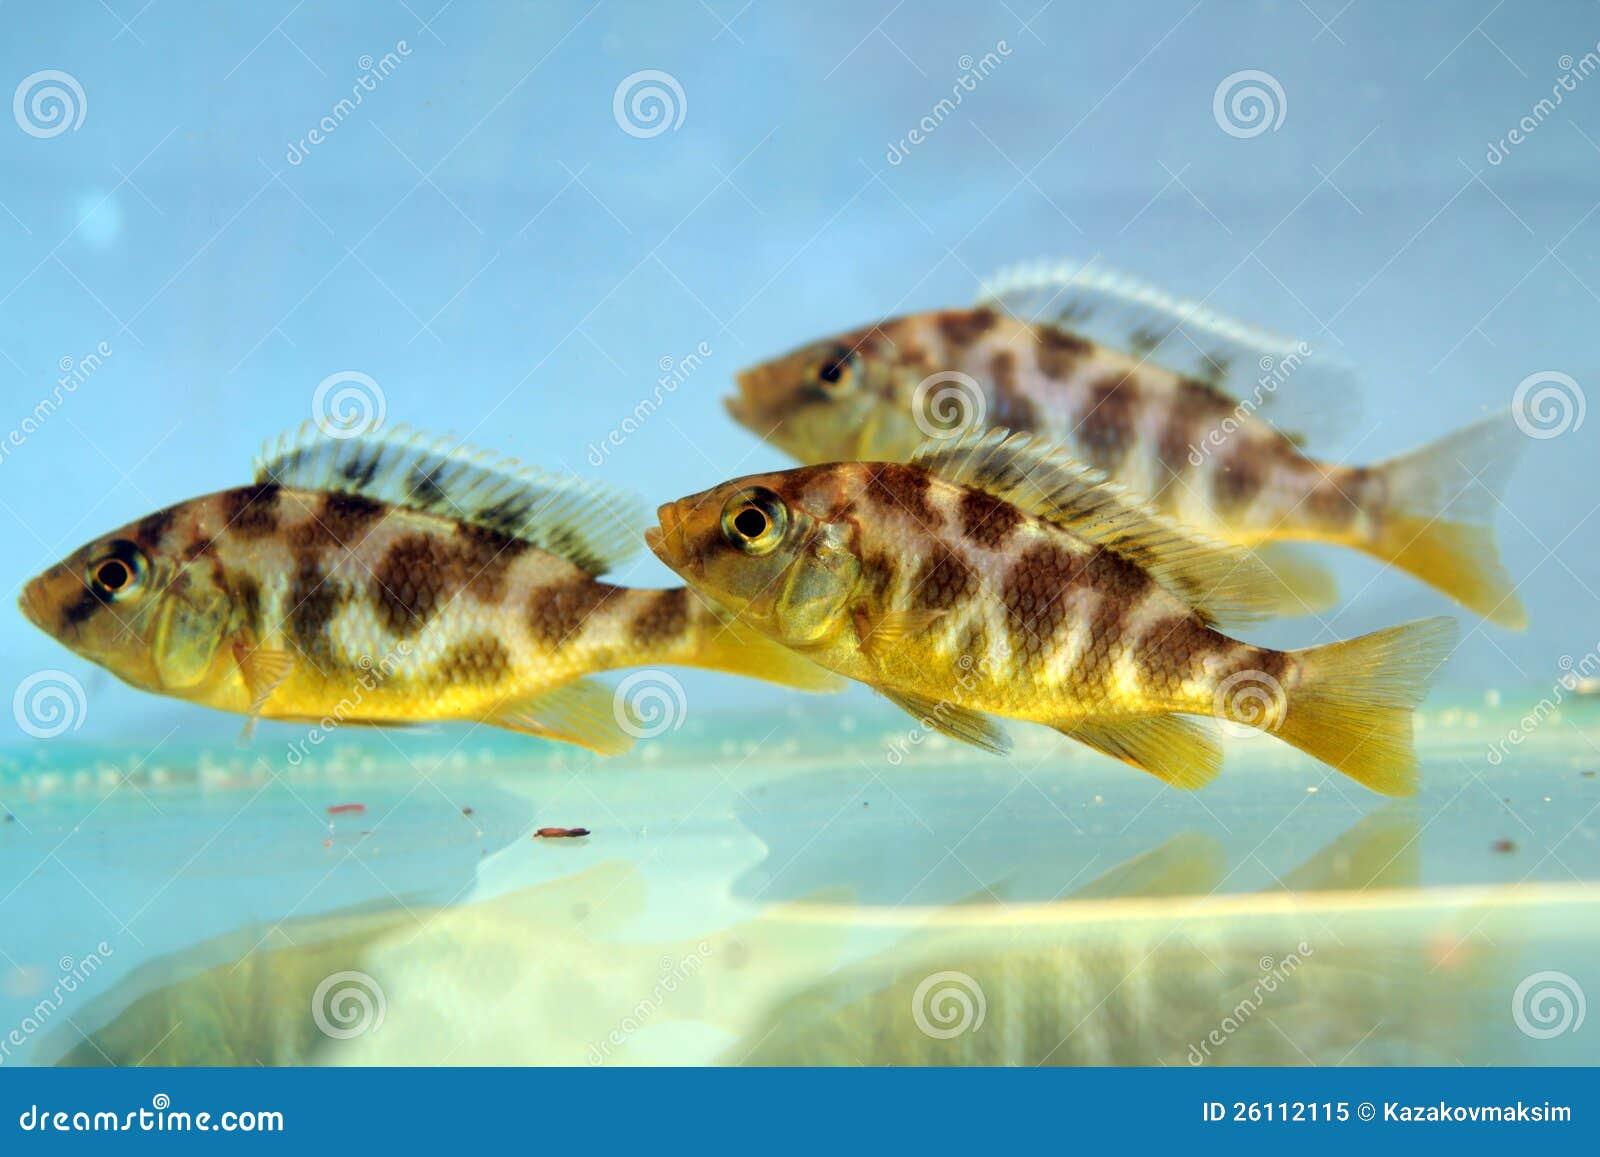 Venustus Hap : Nimbochromis Venustus (Venustus Hap) Royalty Free Stock Photo - Image ...